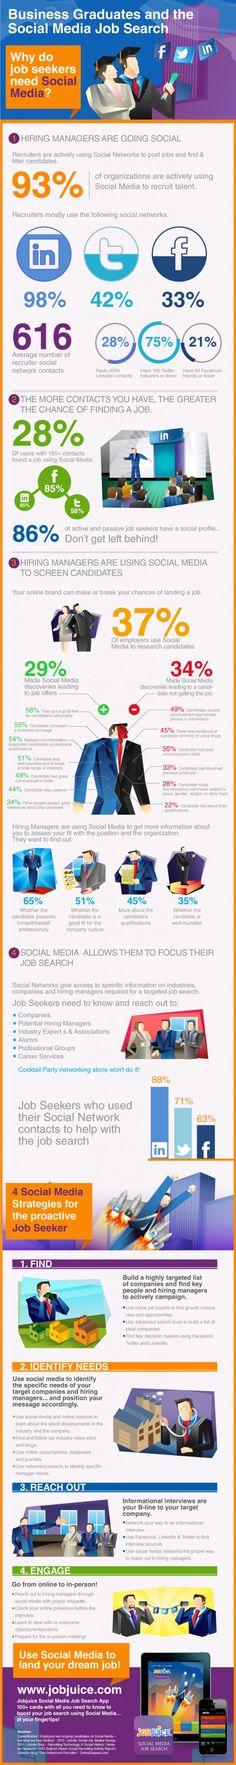 4 Social media Strategies for job seekers